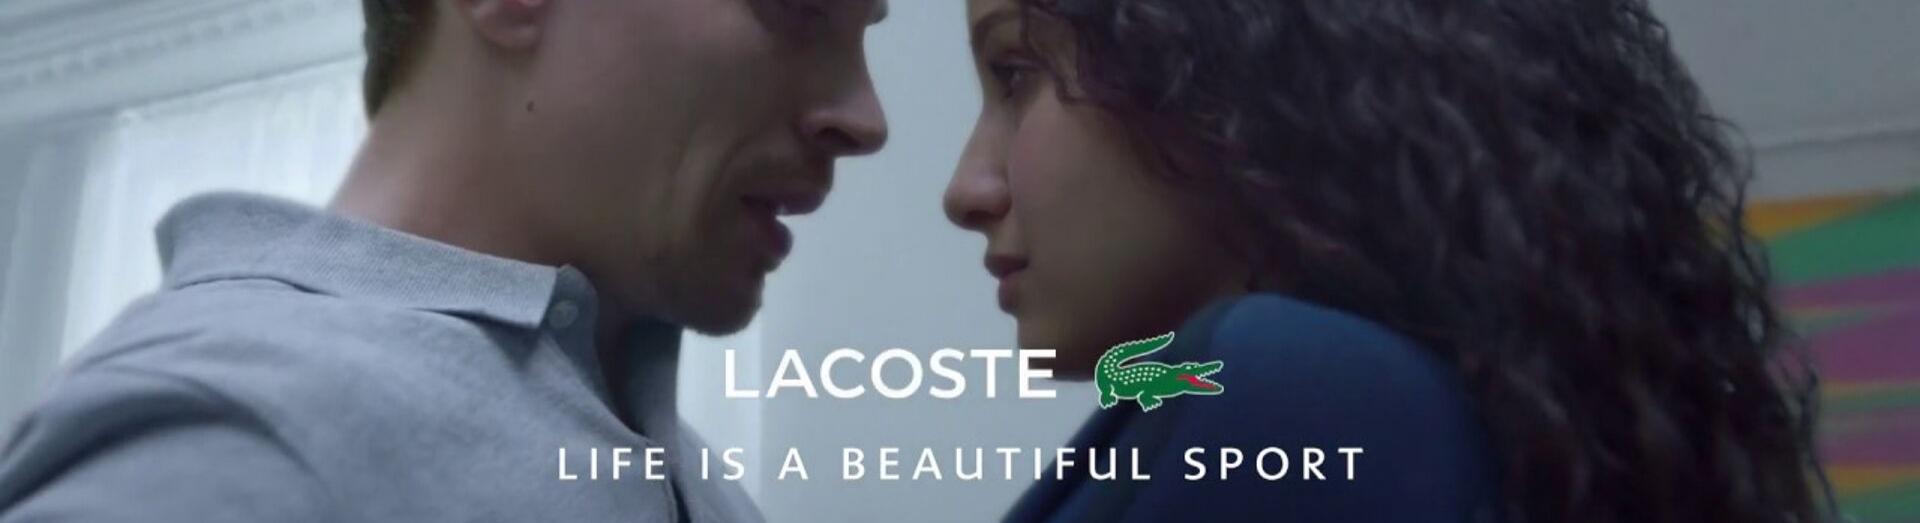 Lacoste - Crocodile Inside